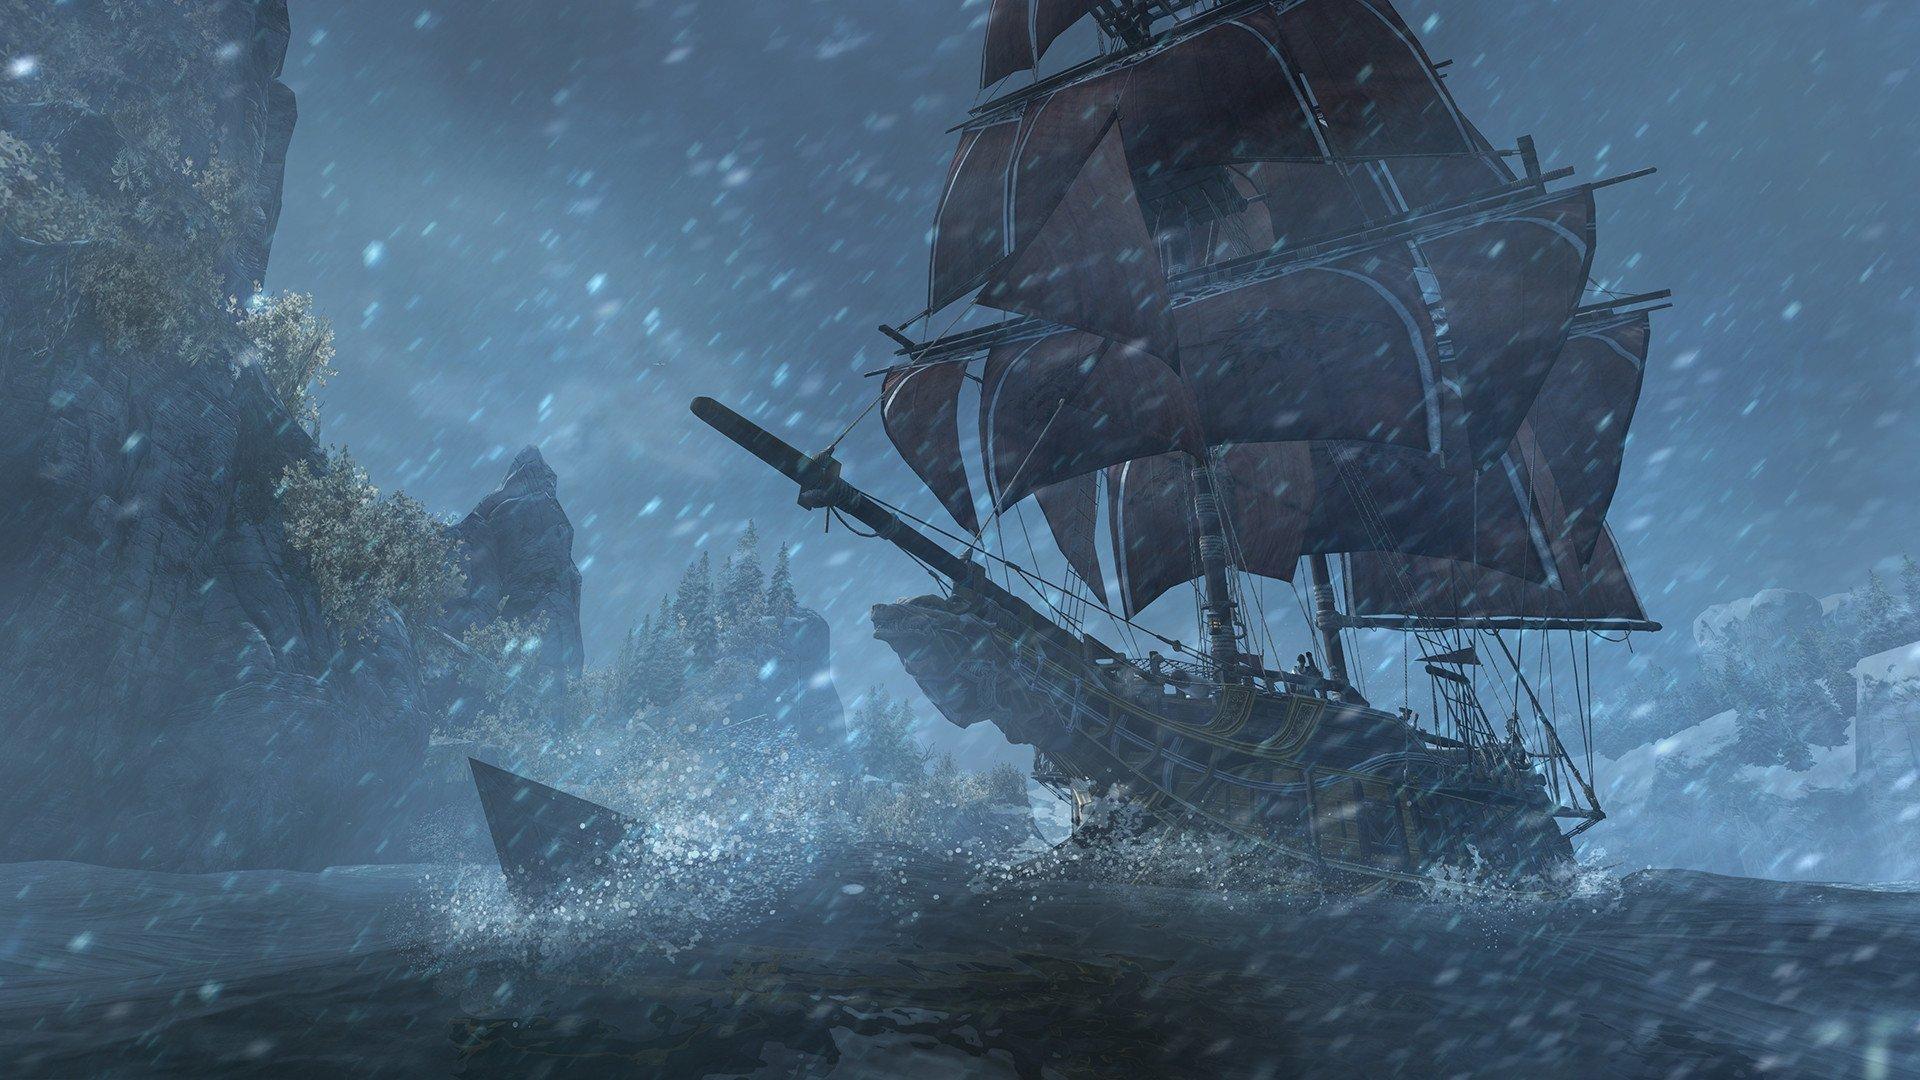 Assassin's Creed: Rogue Computer Wallpapers, Desktop ...